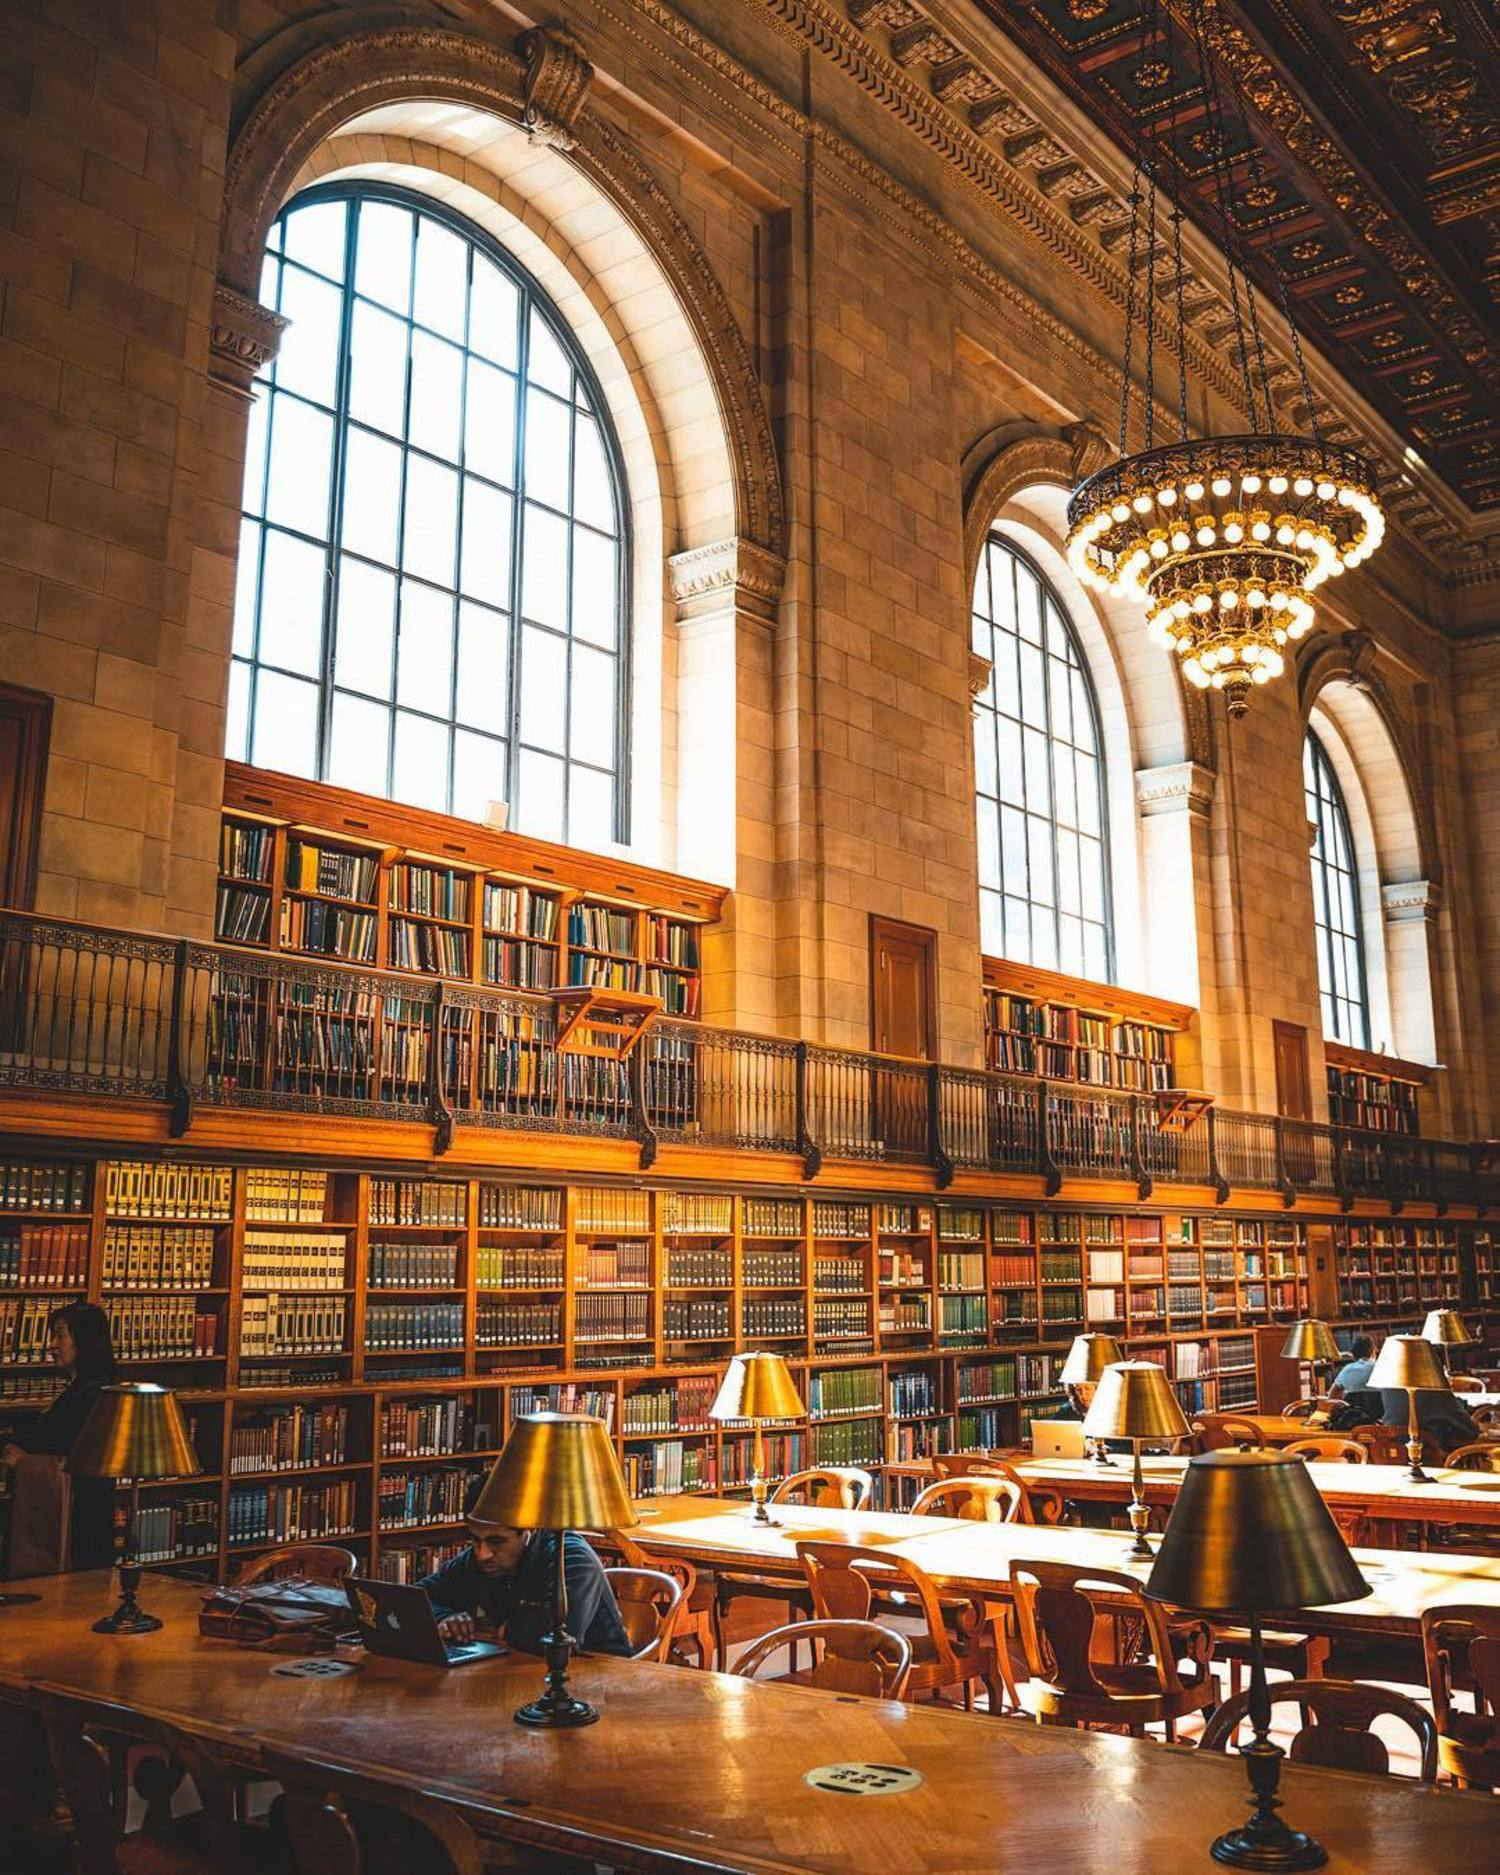 Rose Reading Room, NEw York Public Library, Midtown, Manhattan